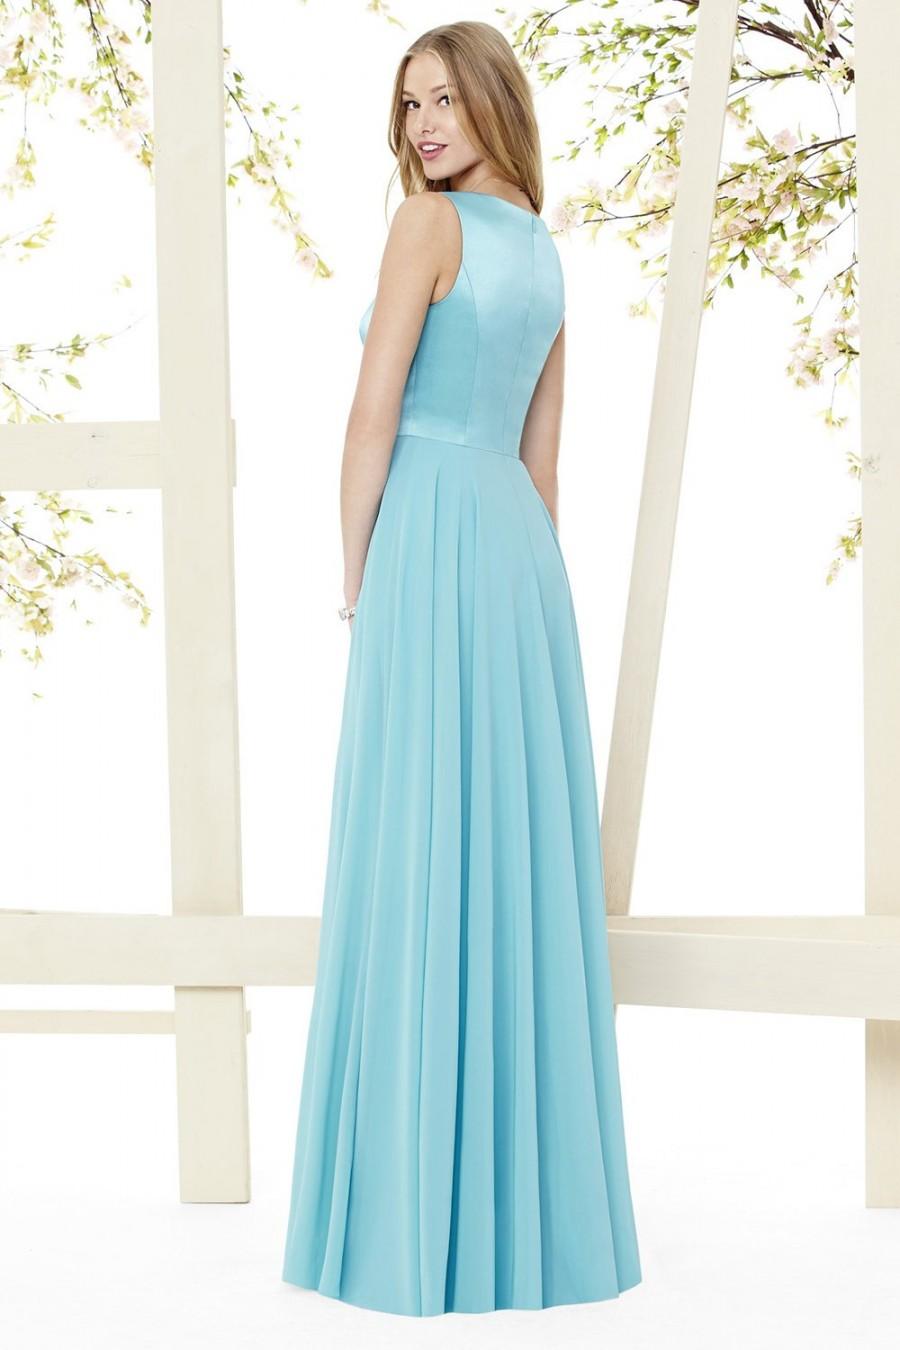 Modern Elegant Simple Wedding Dresses Image - All Wedding Dresses ...